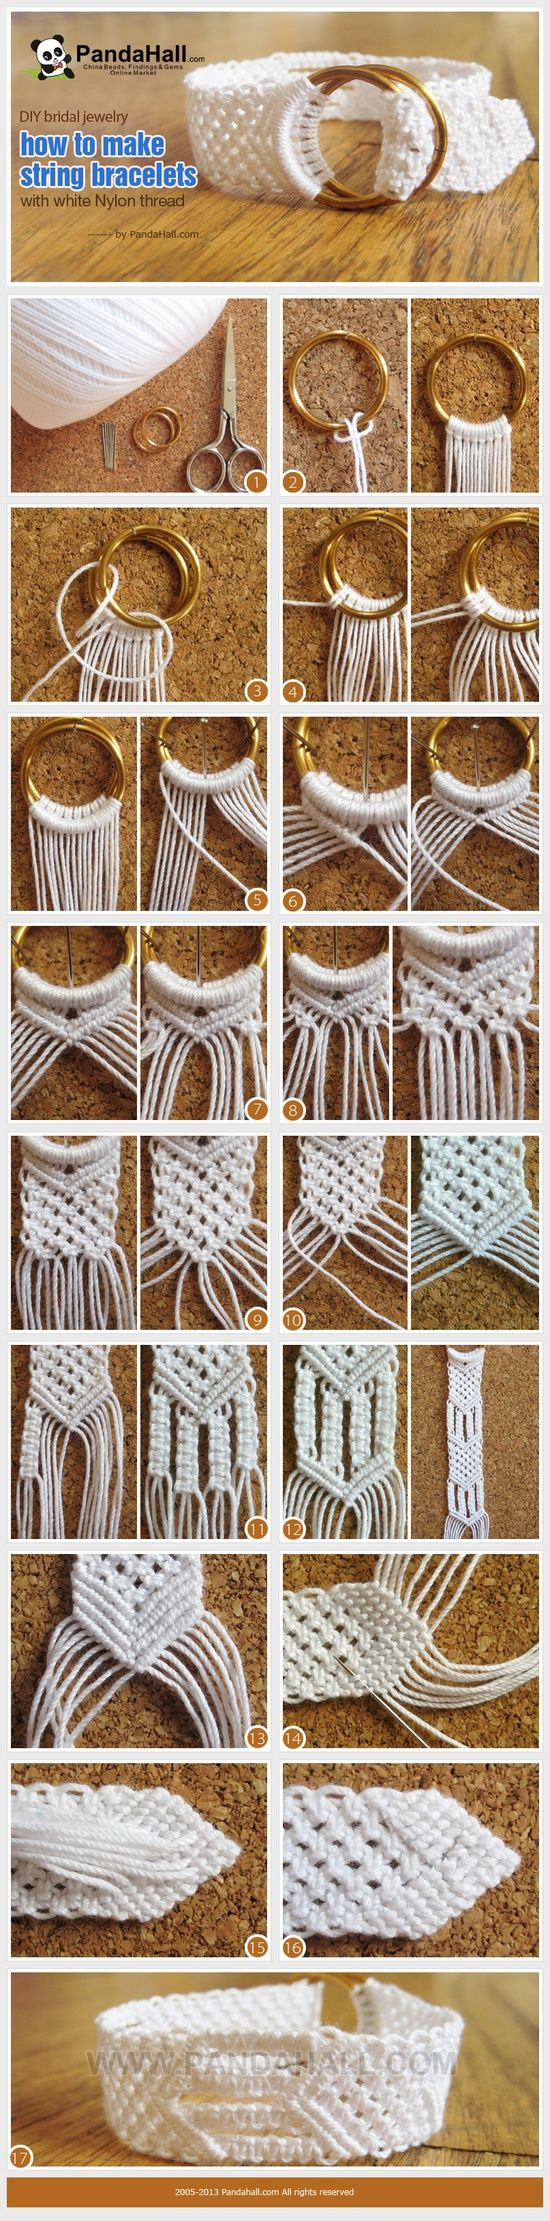 String bracelet: